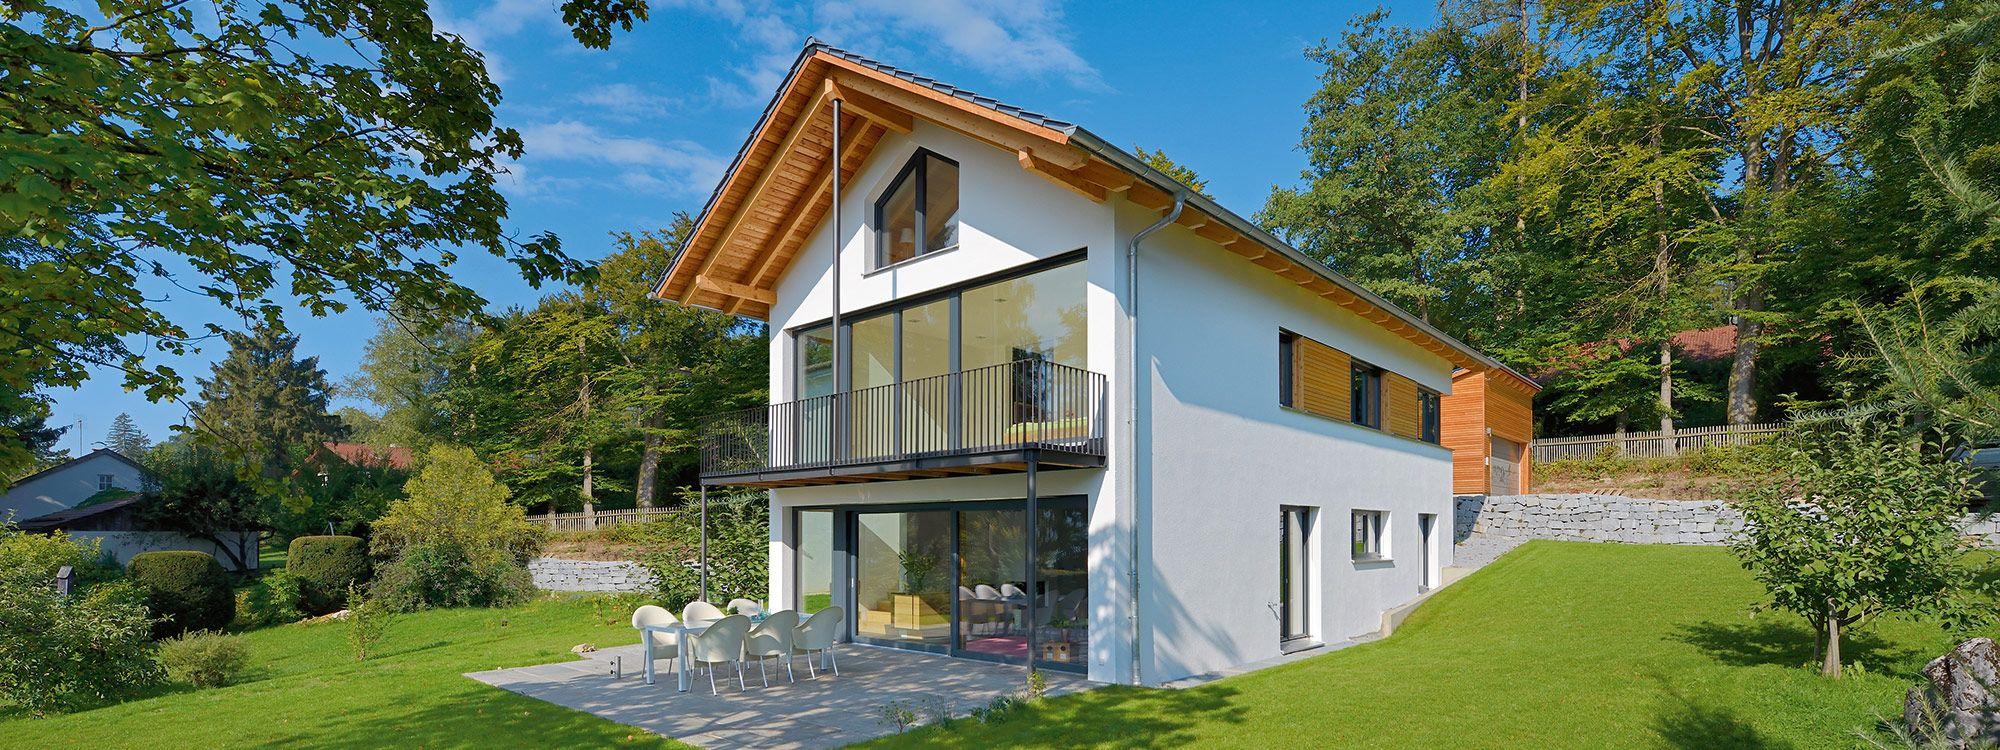 Tirolia Holzhaus tirolia blockhaus holzhaus design als wrfel haus holzhuser